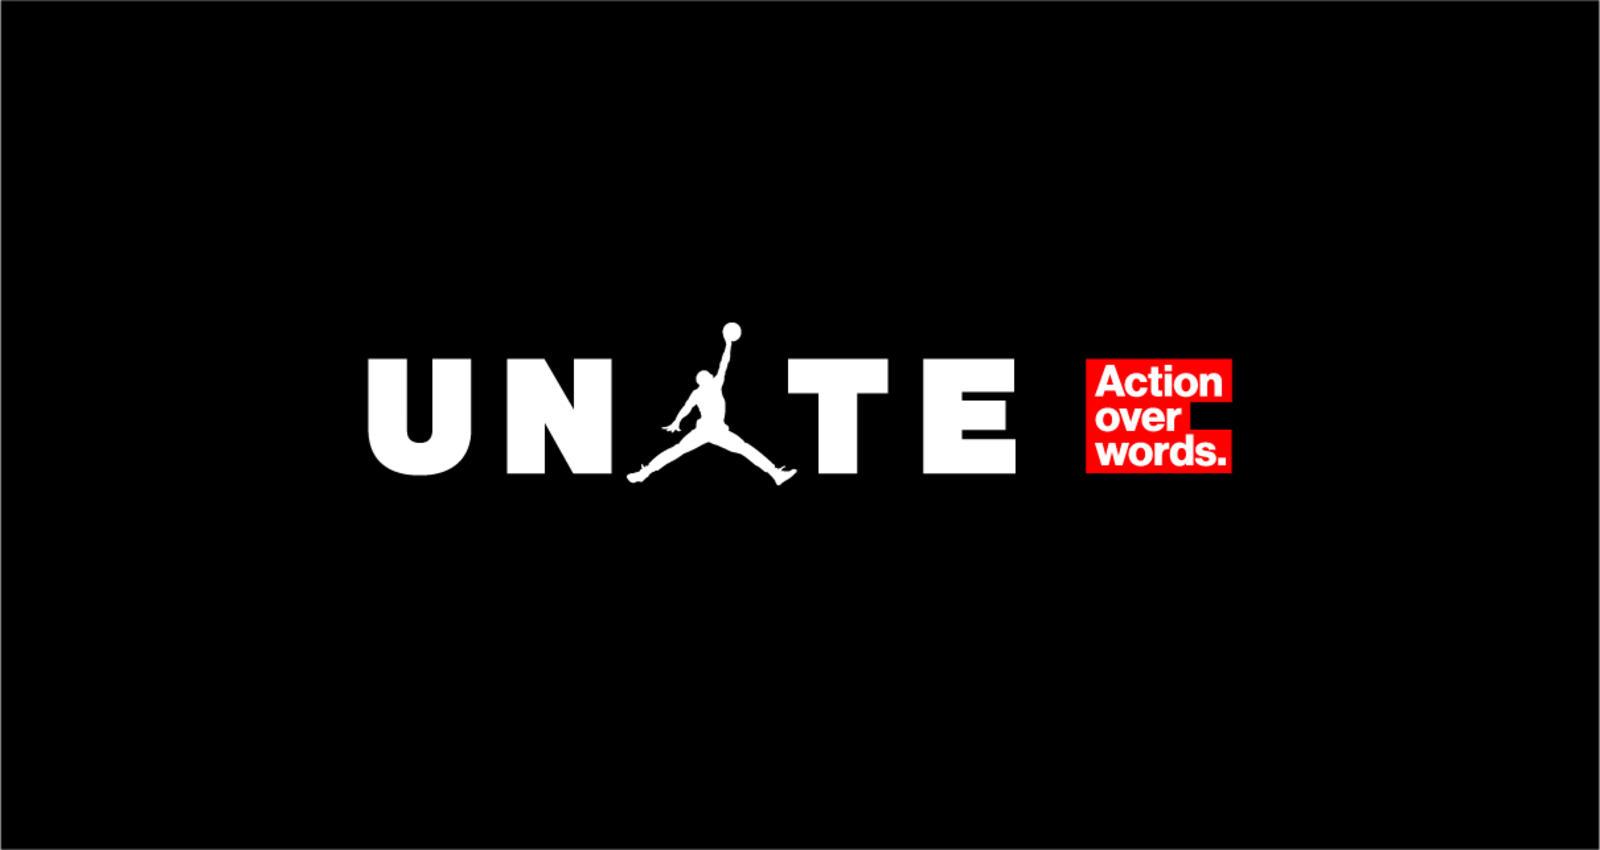 Jordan Brand Announces Next Steps in $100M Black Community Commitment